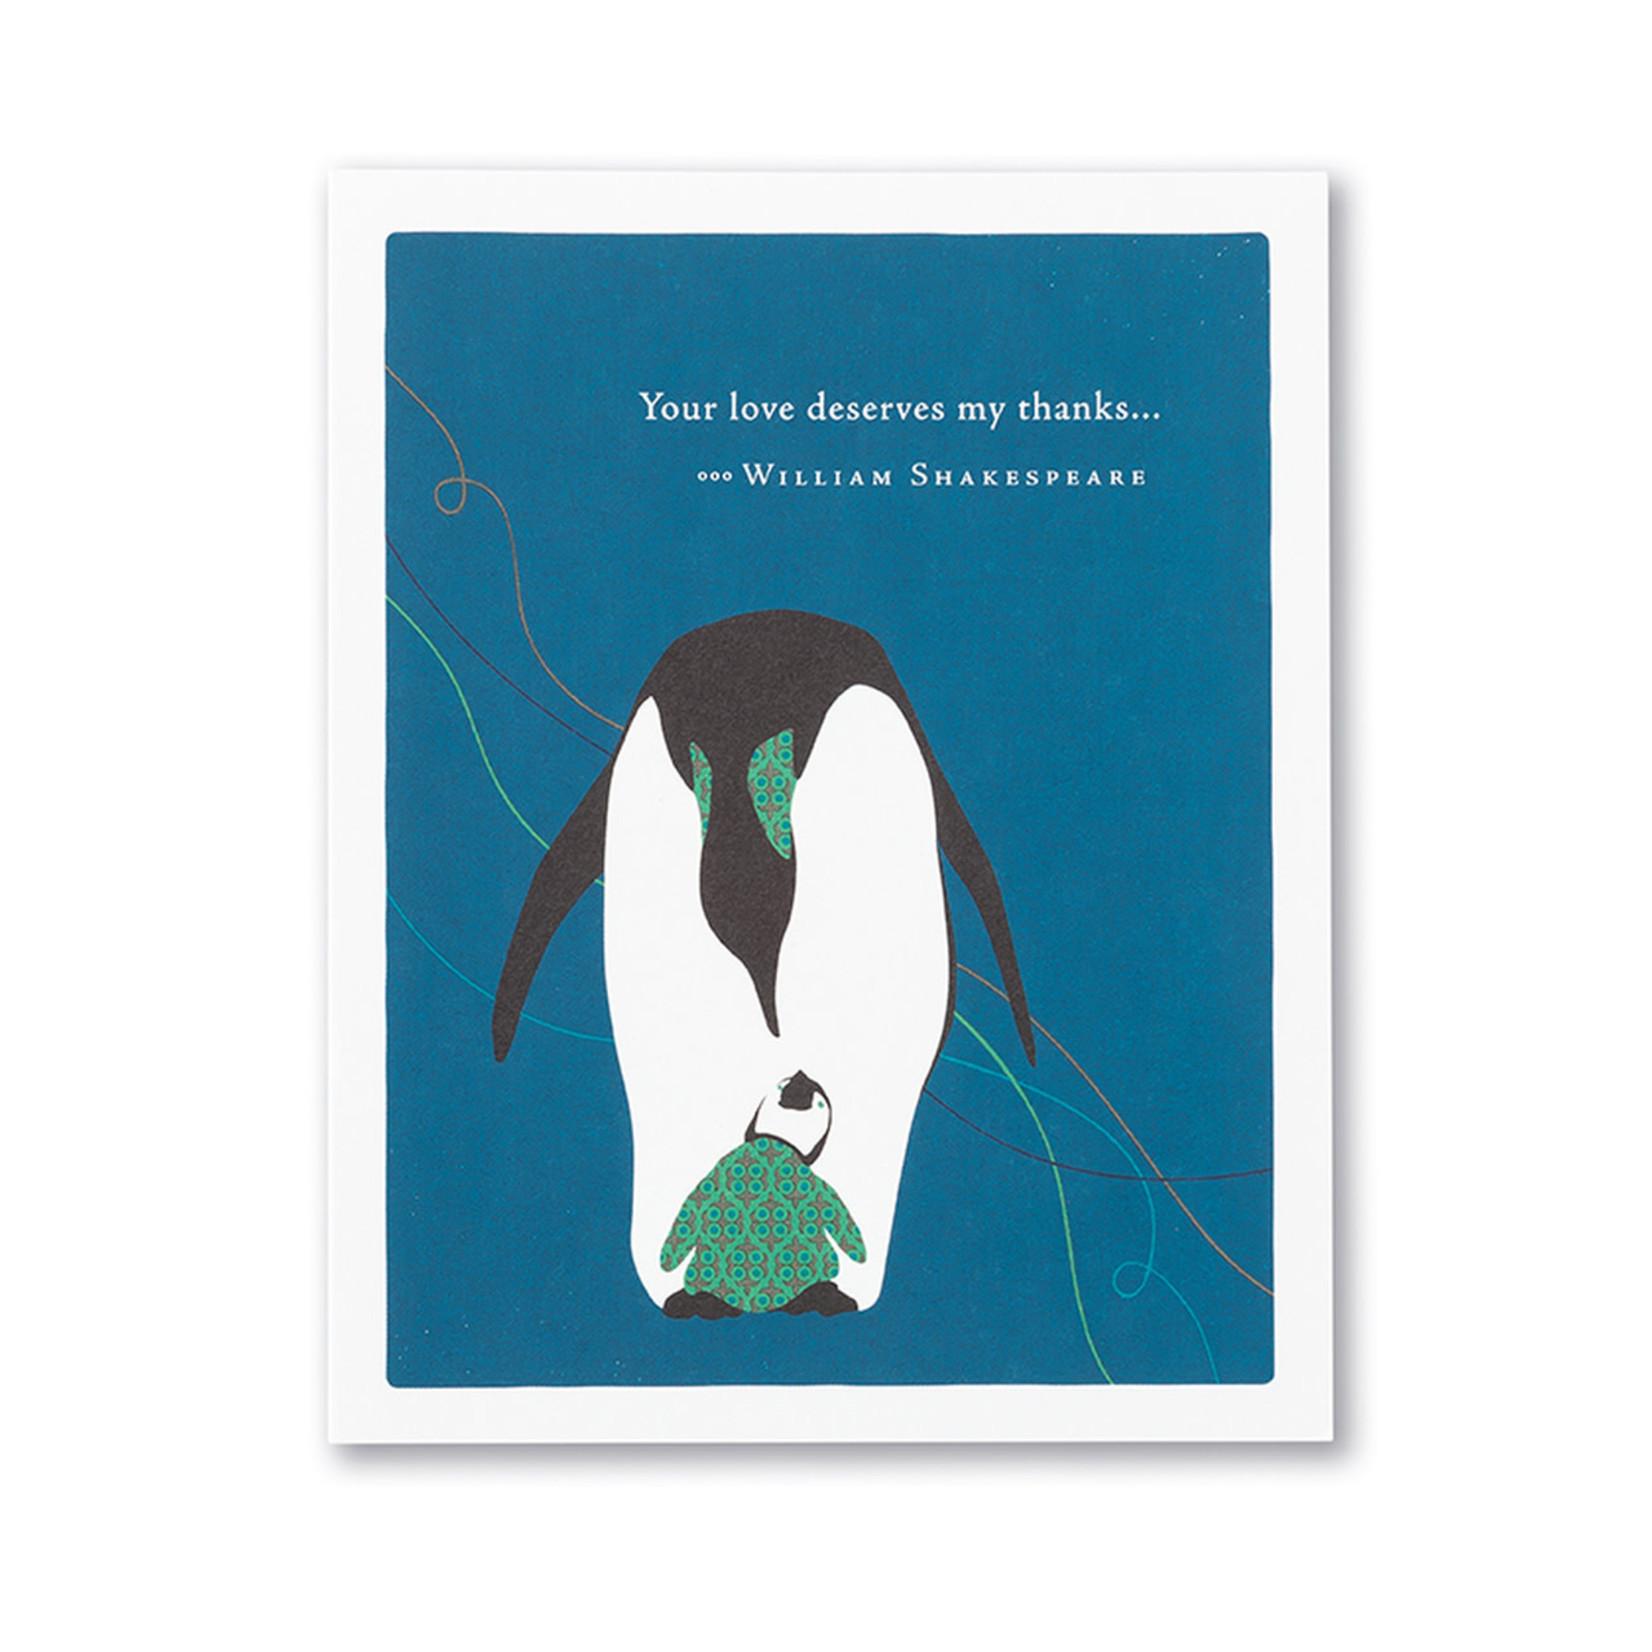 YOUR LOVE DESERVES CARD